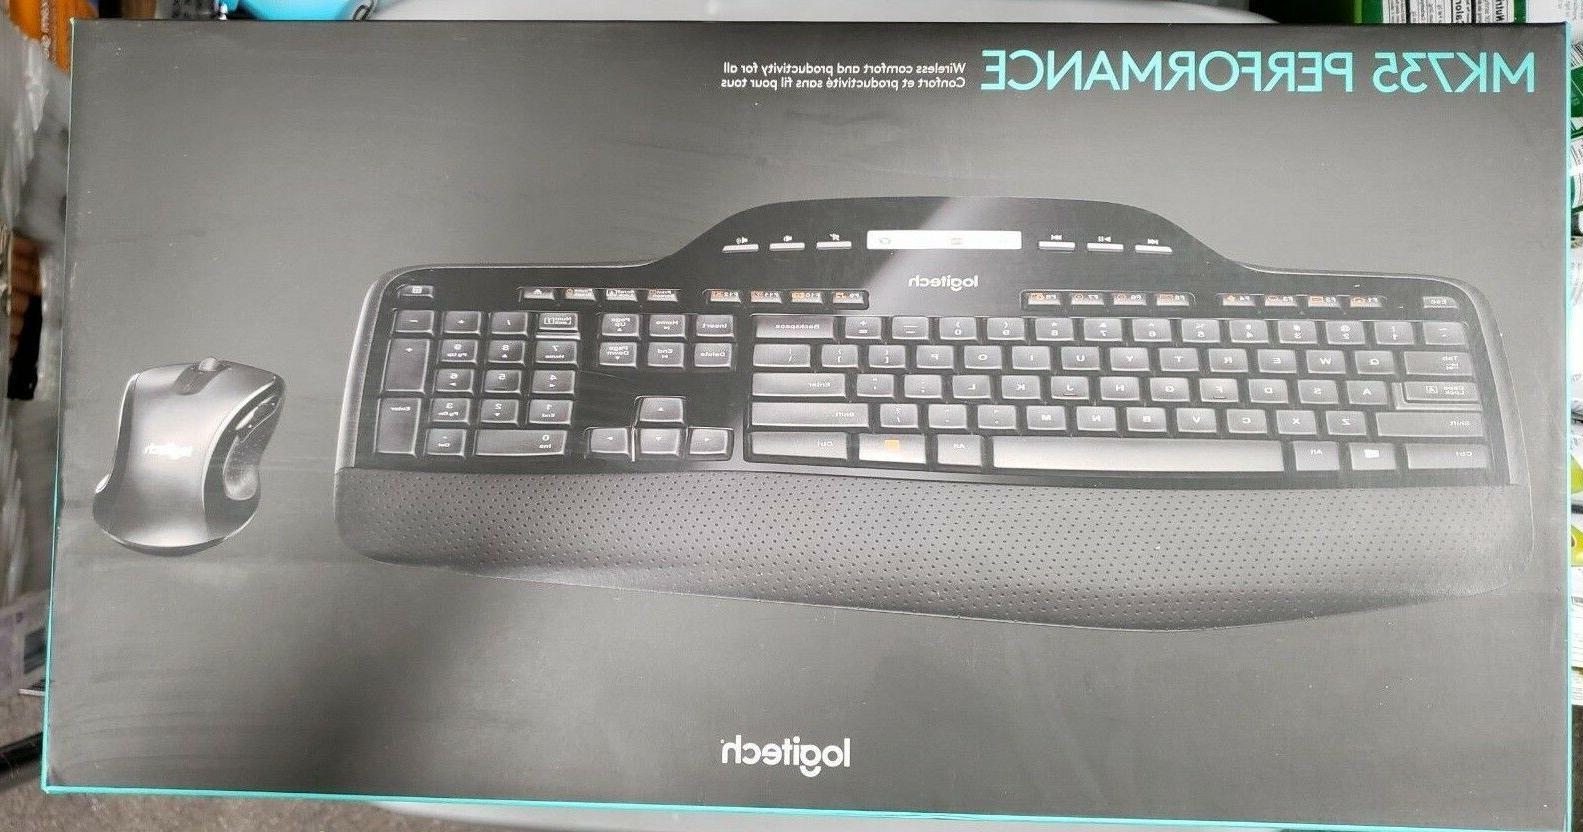 mk735 wireless keyboard mouse combo